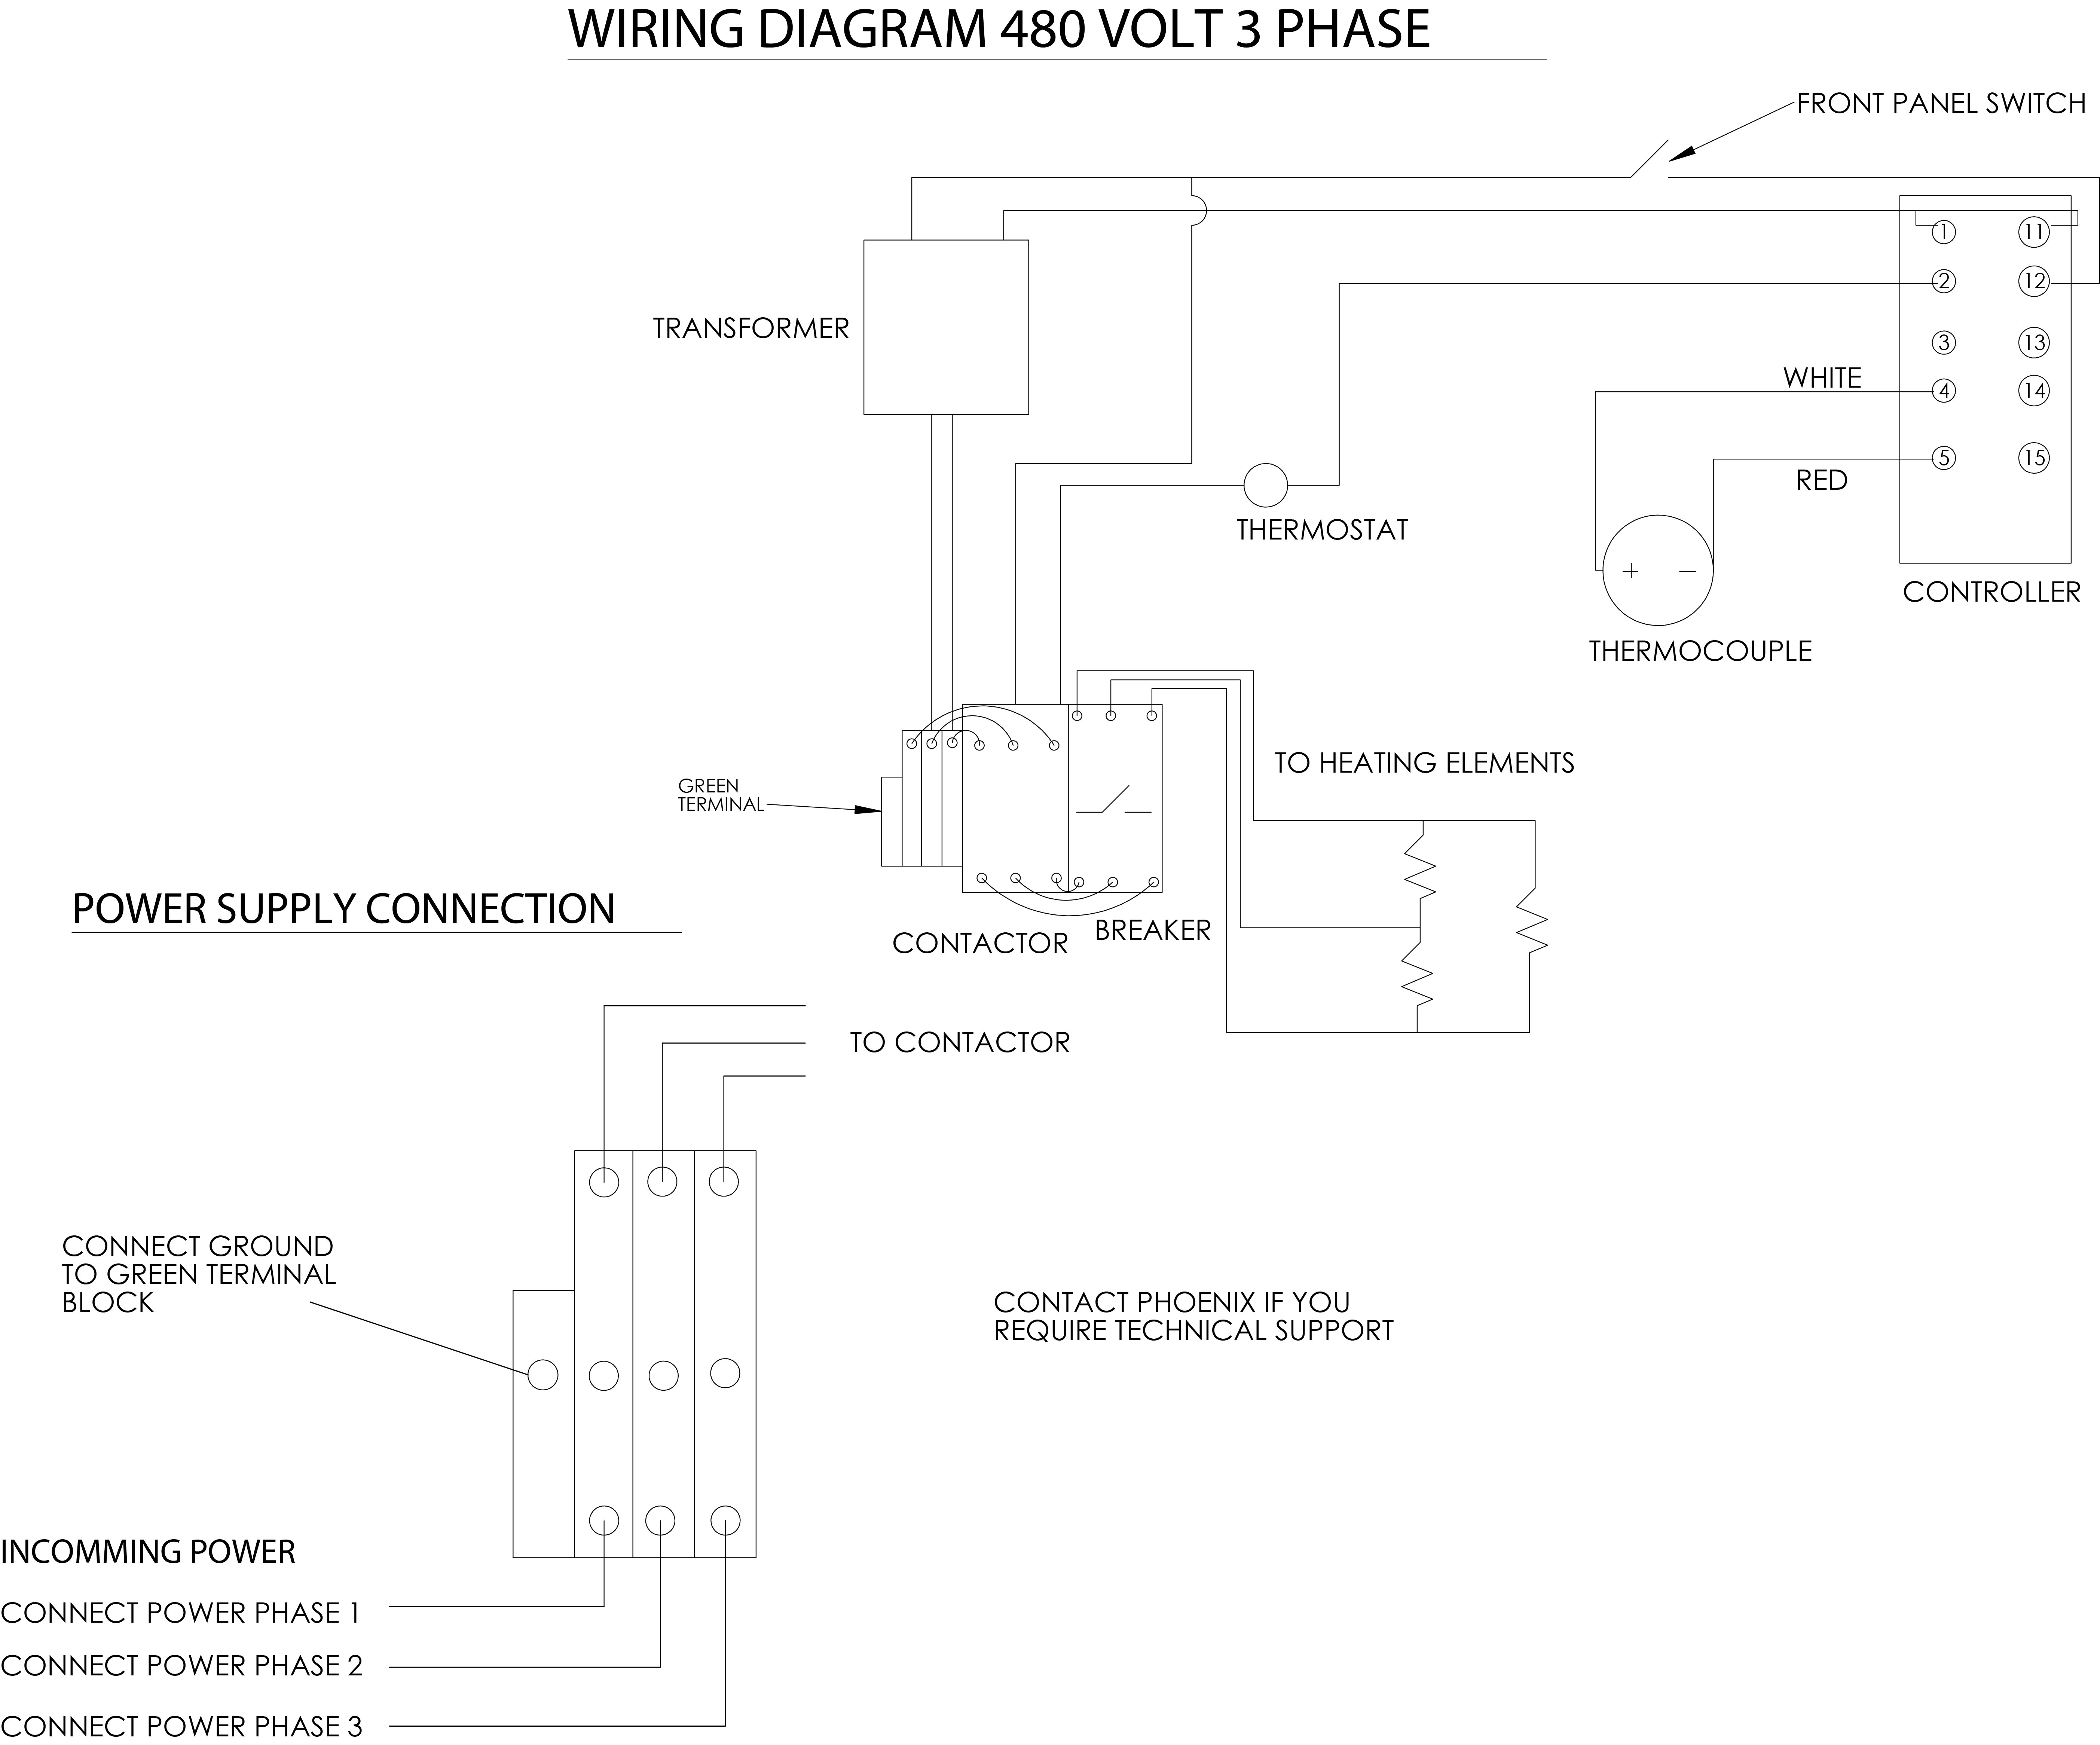 480 volt transformers wiring up 480v 3 phase wiring diagram wiring diagram data  480v 3 phase wiring diagram wiring